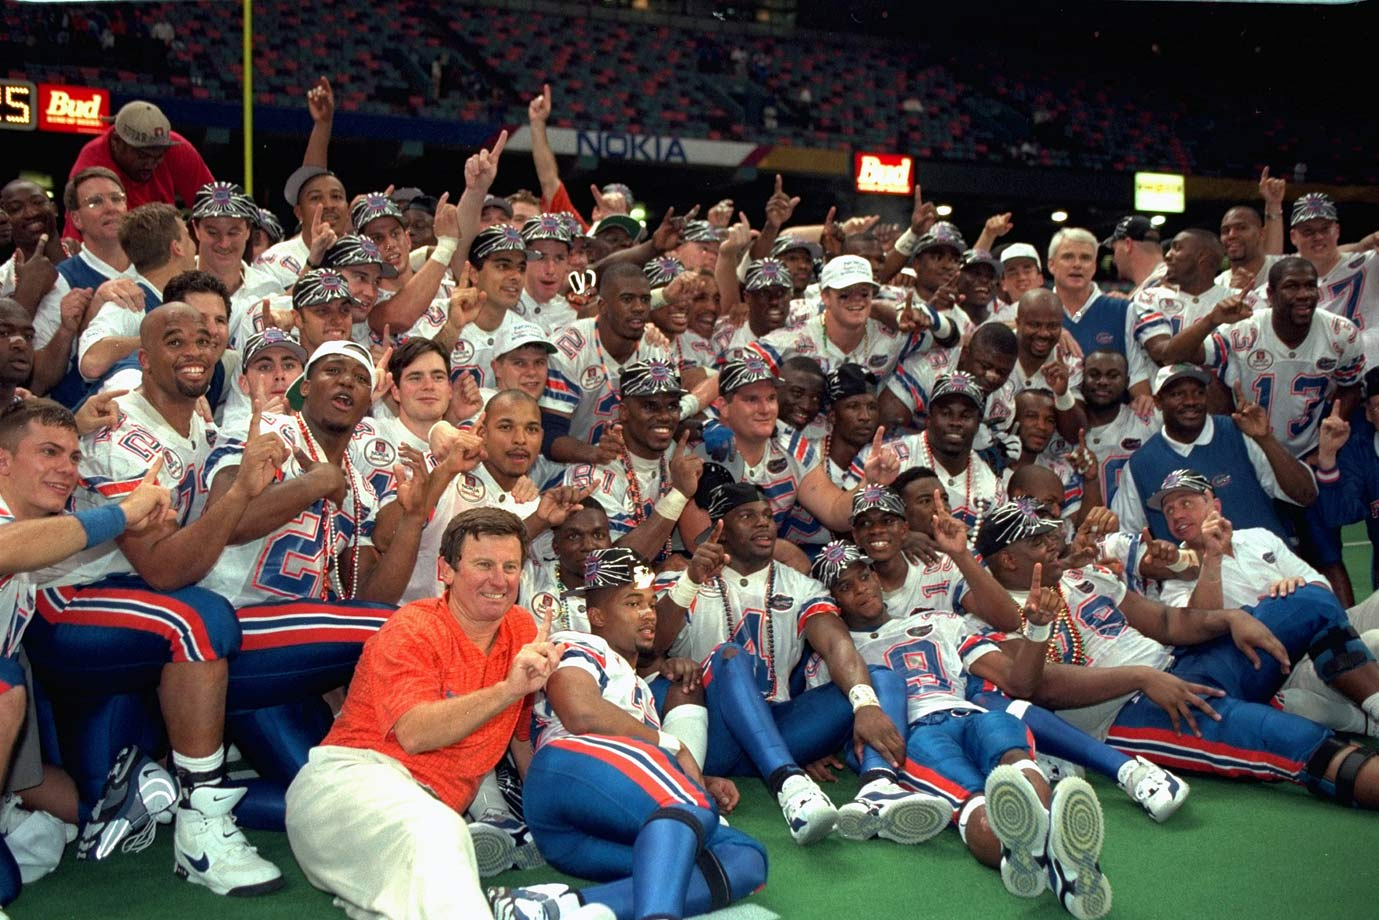 1997 Sugar Bowl